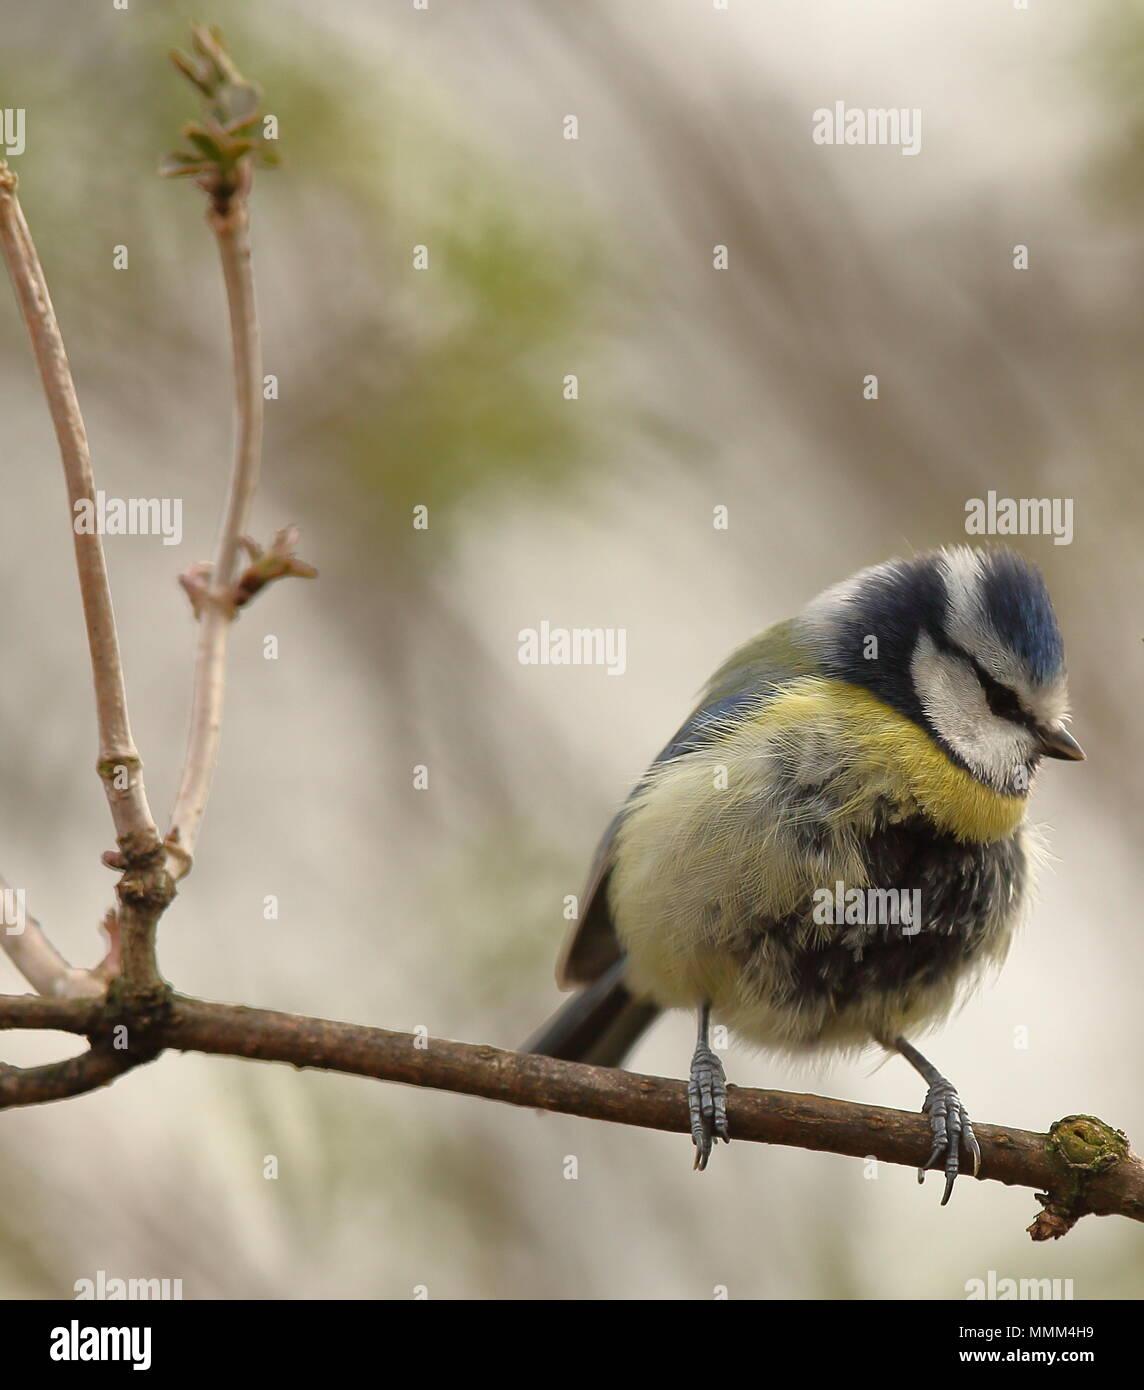 Bluetit taken at Victoria park, widnes, cheshire, england - Stock Image